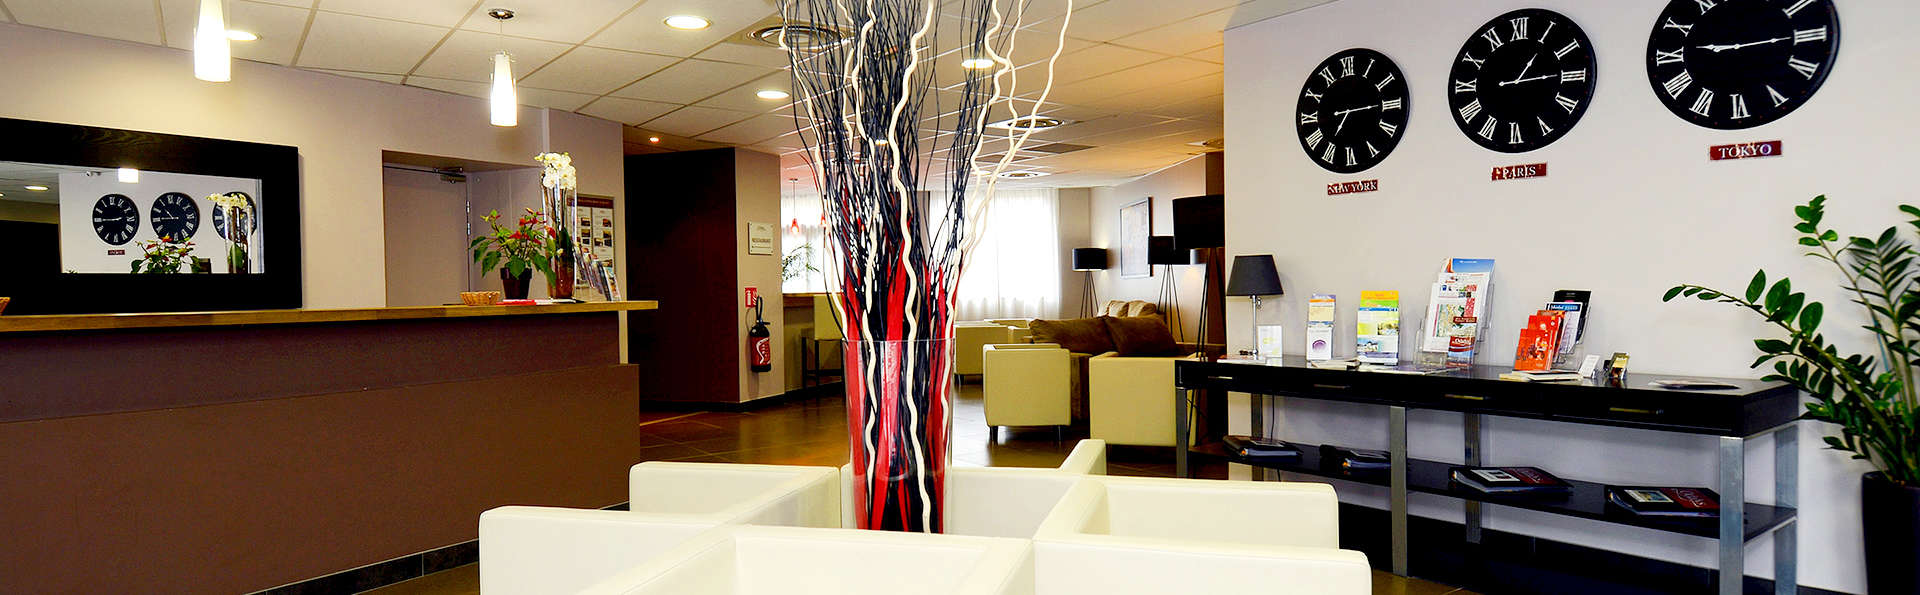 Appart'hôtel et Spa Odalys Ferney Genève - Edit_Reception2.jpg